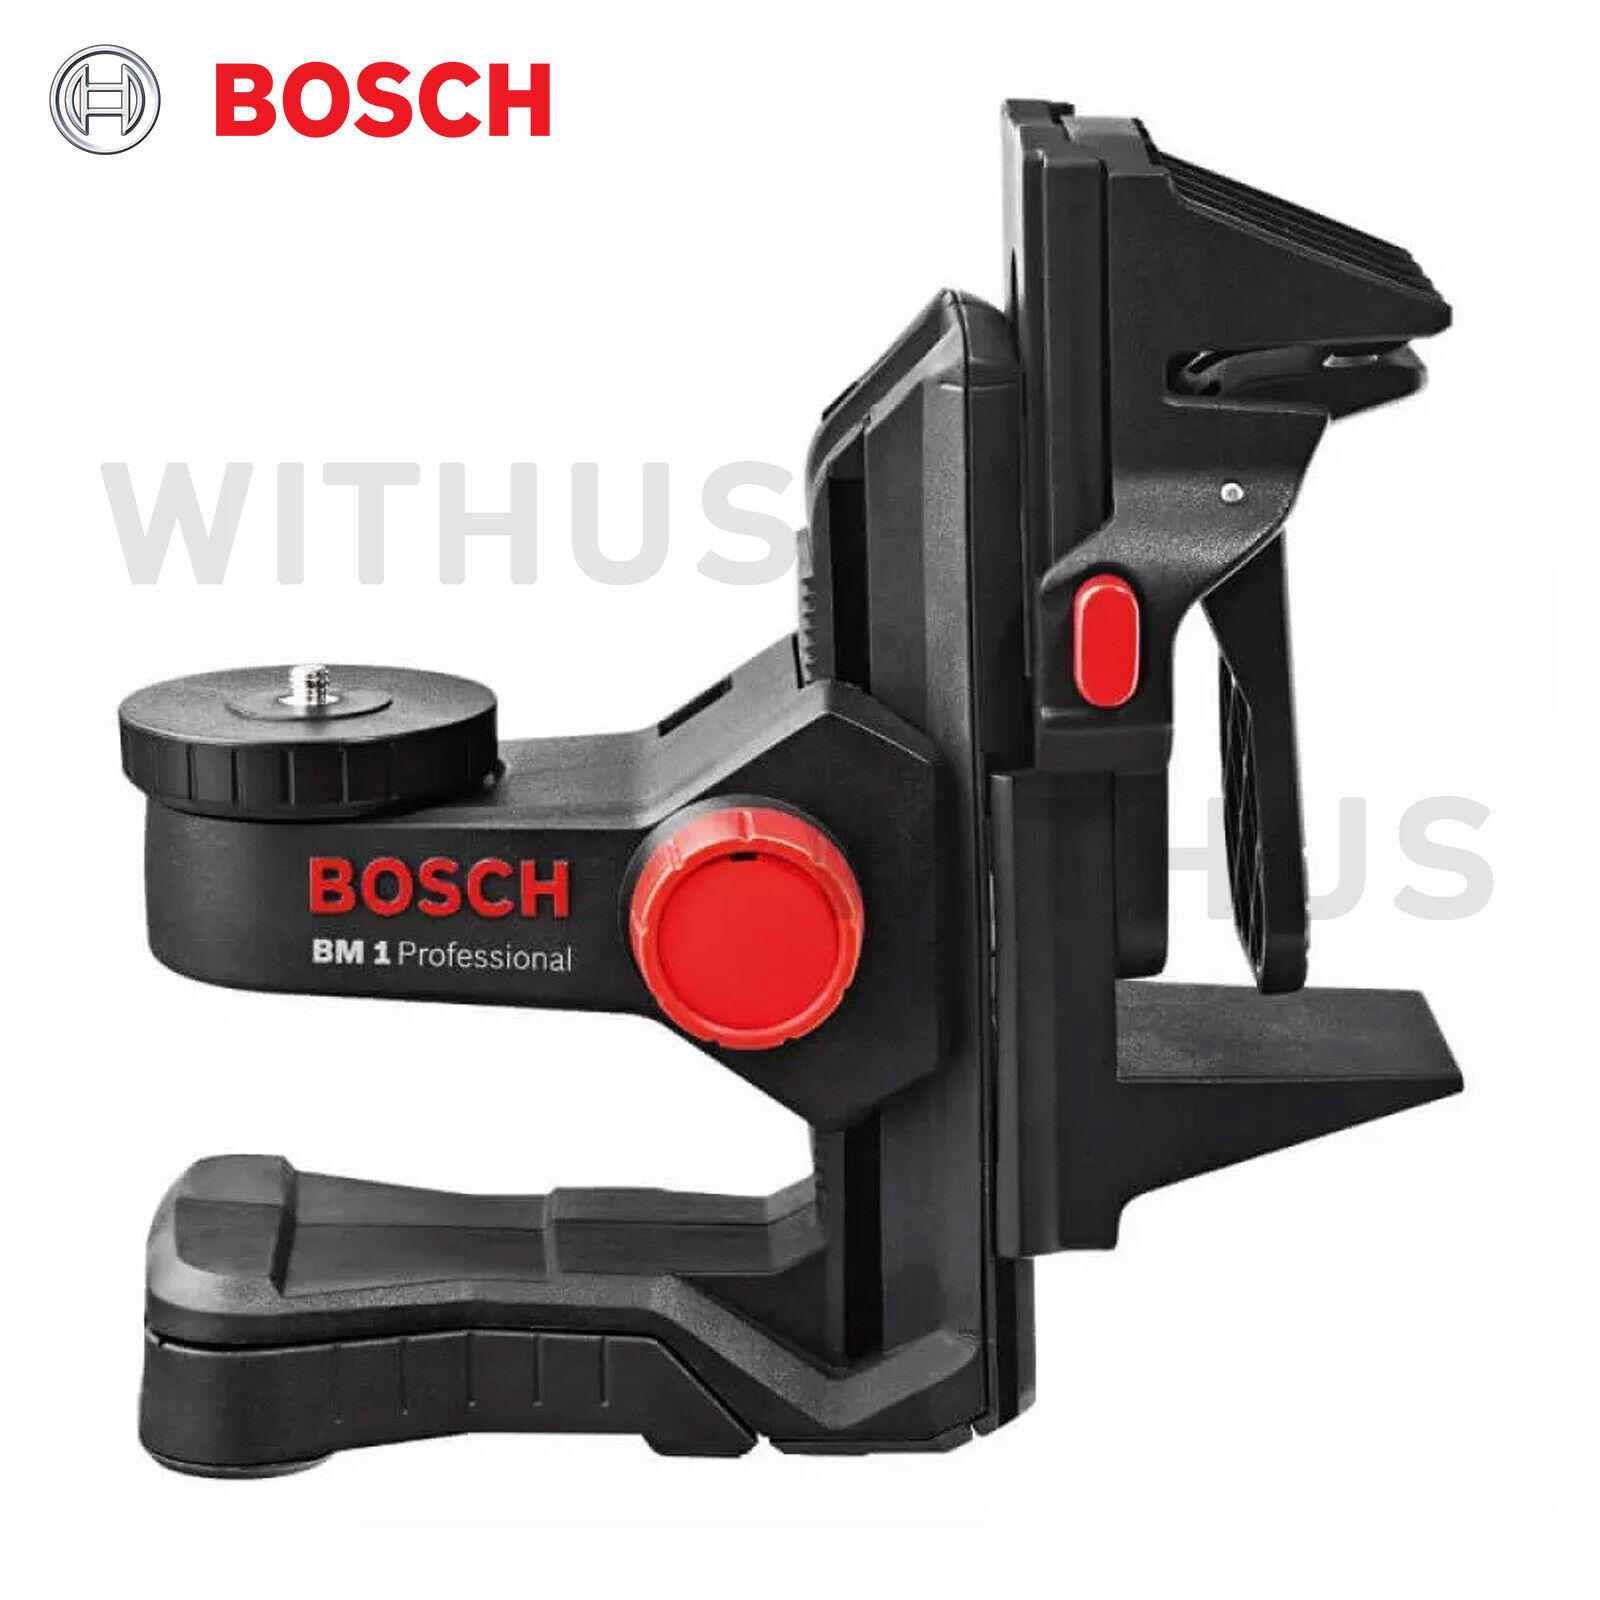 BOSCH  BM 1 Professional Universal Holder Wall Mount for Laser Level